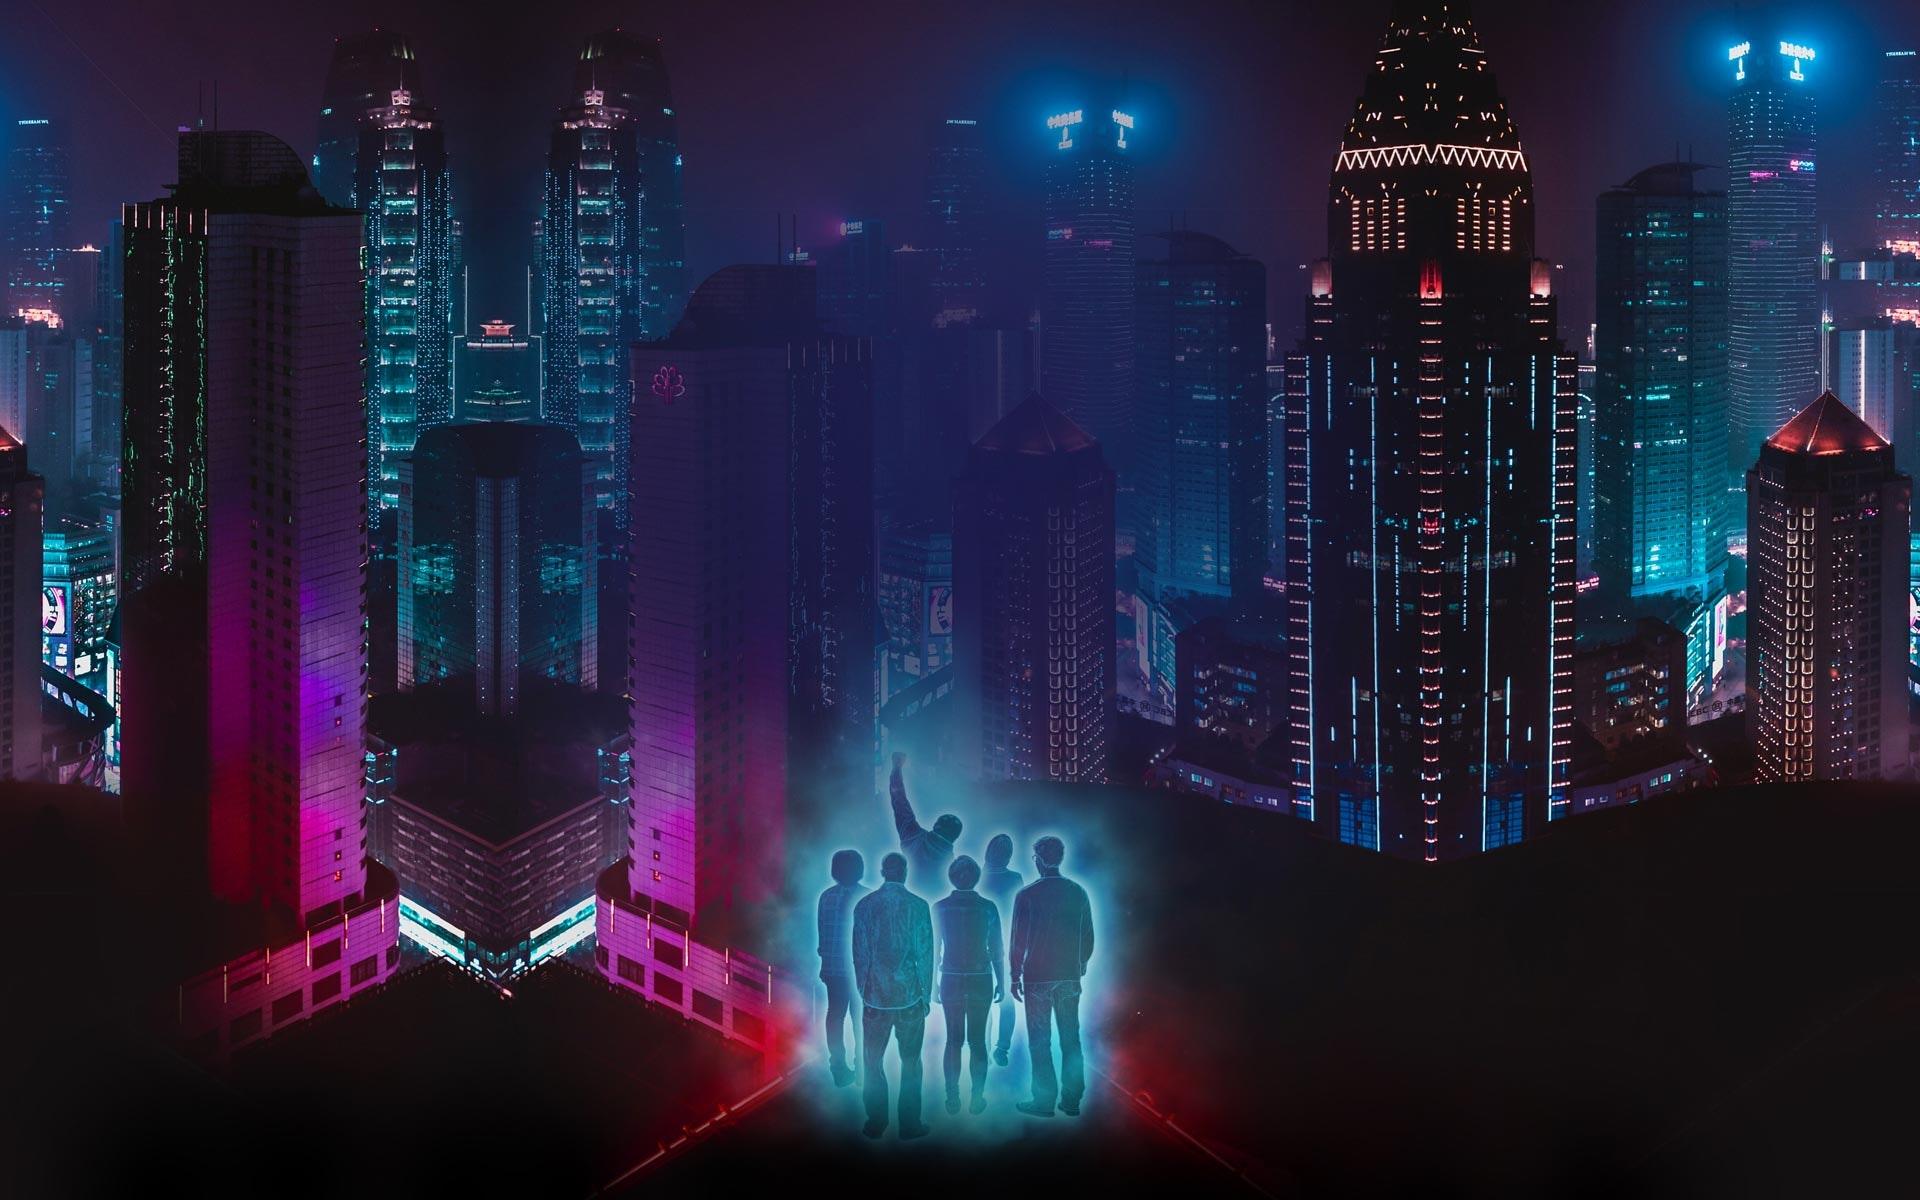 'The Humans Strike Back' by Hotjar